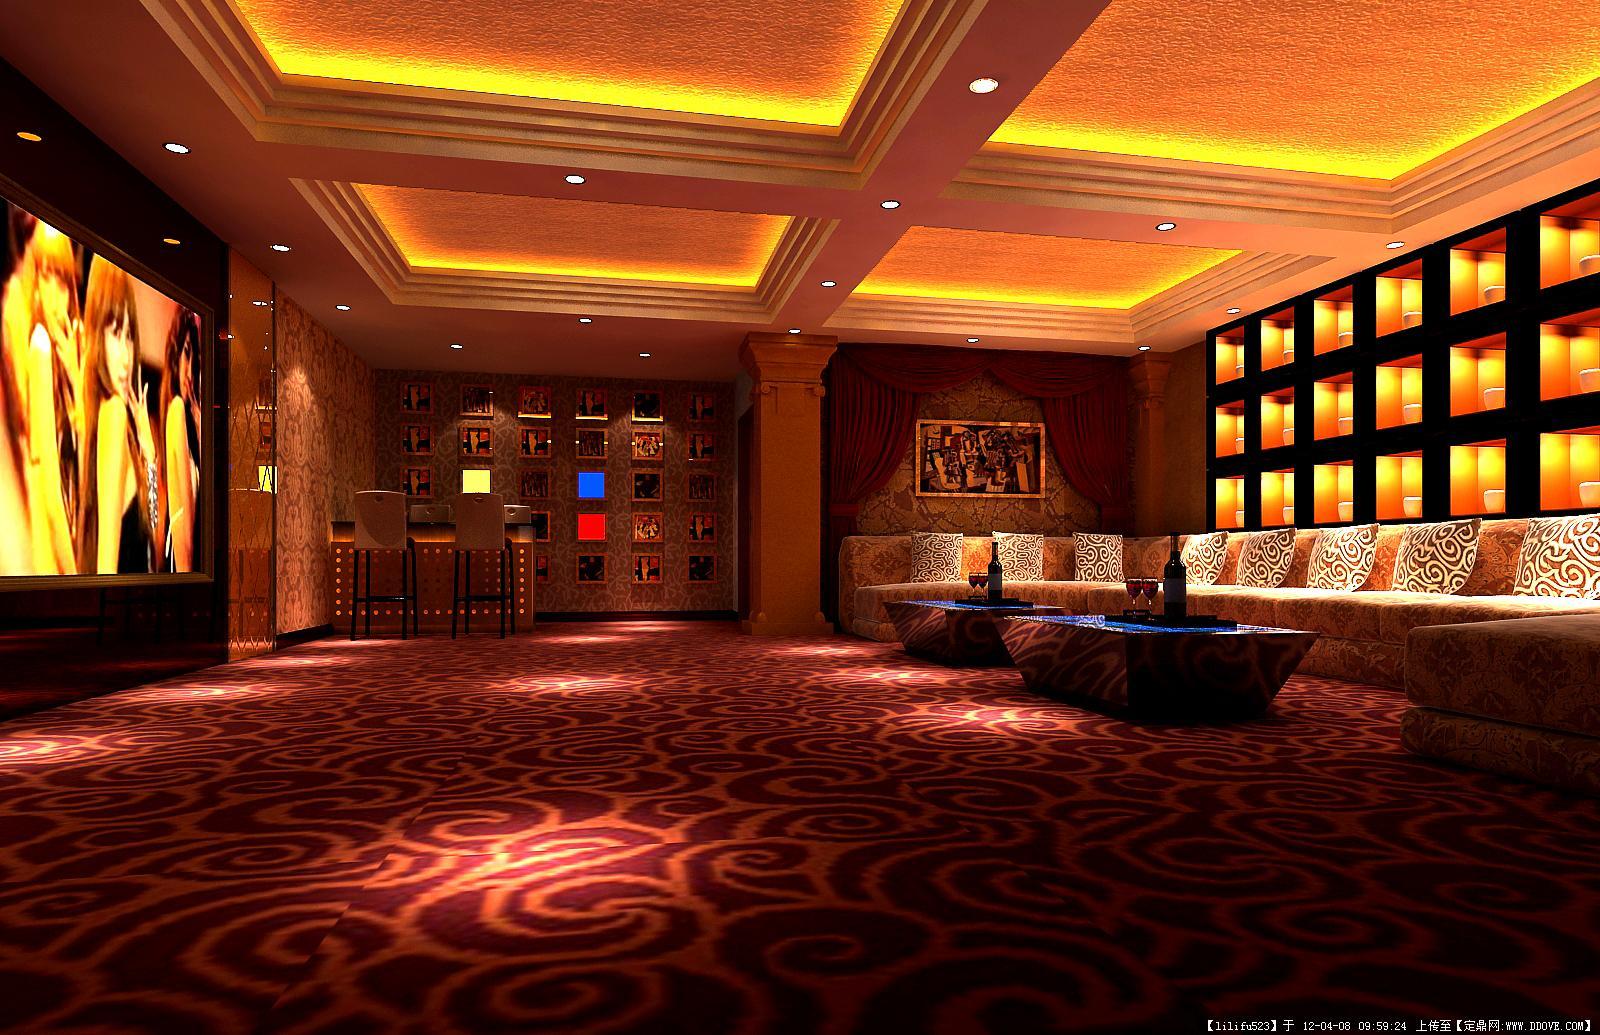 ktv3装修效果图的图片浏览,室内效果图,酒店会所,室内